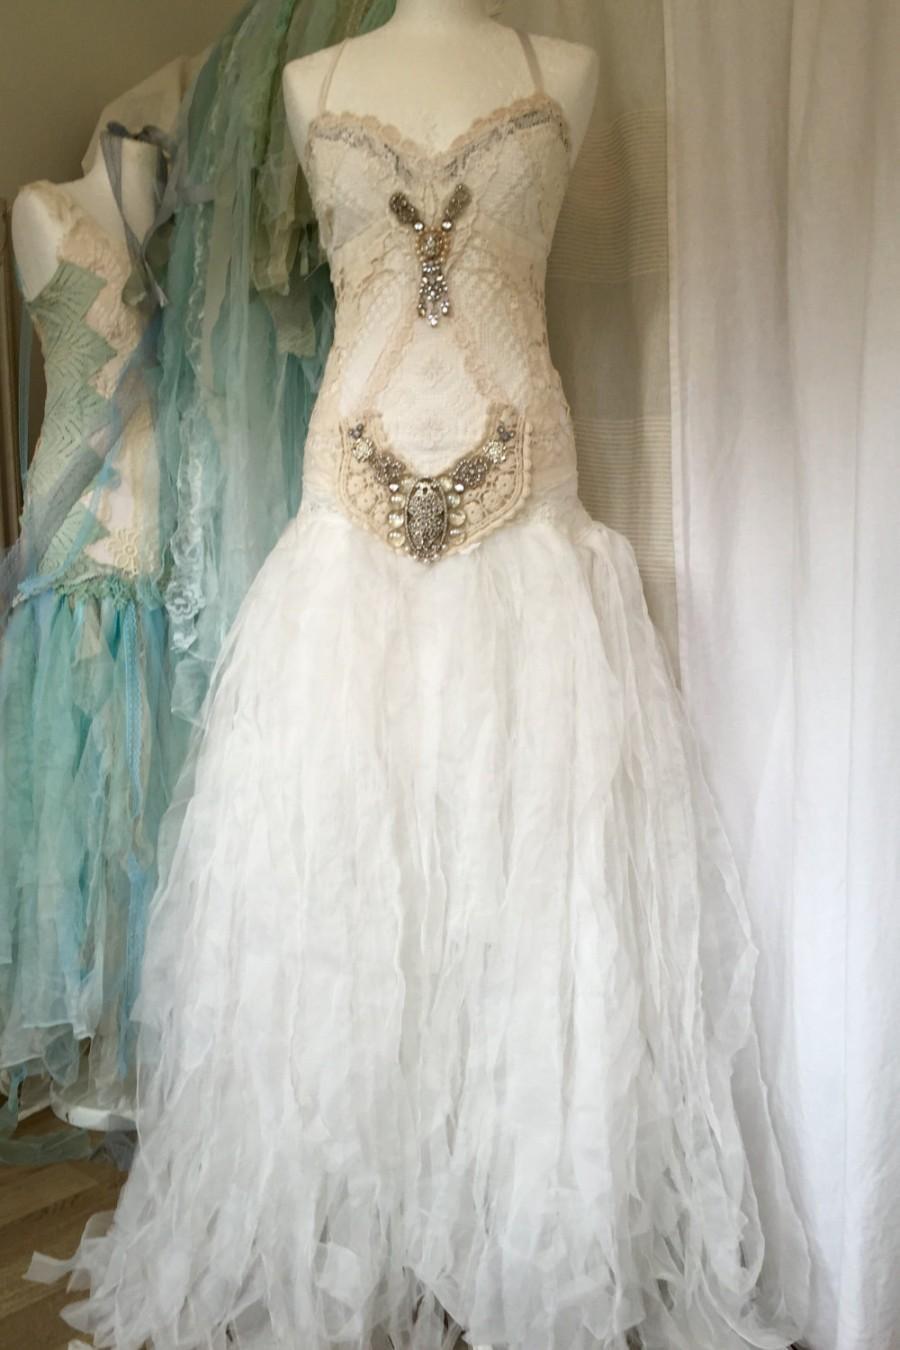 Hochzeit - Statement wedding dress,bridal gown extraordinaire,bohemian wedding dress,lace wedding dress, alternative wedding dress,statement wedding